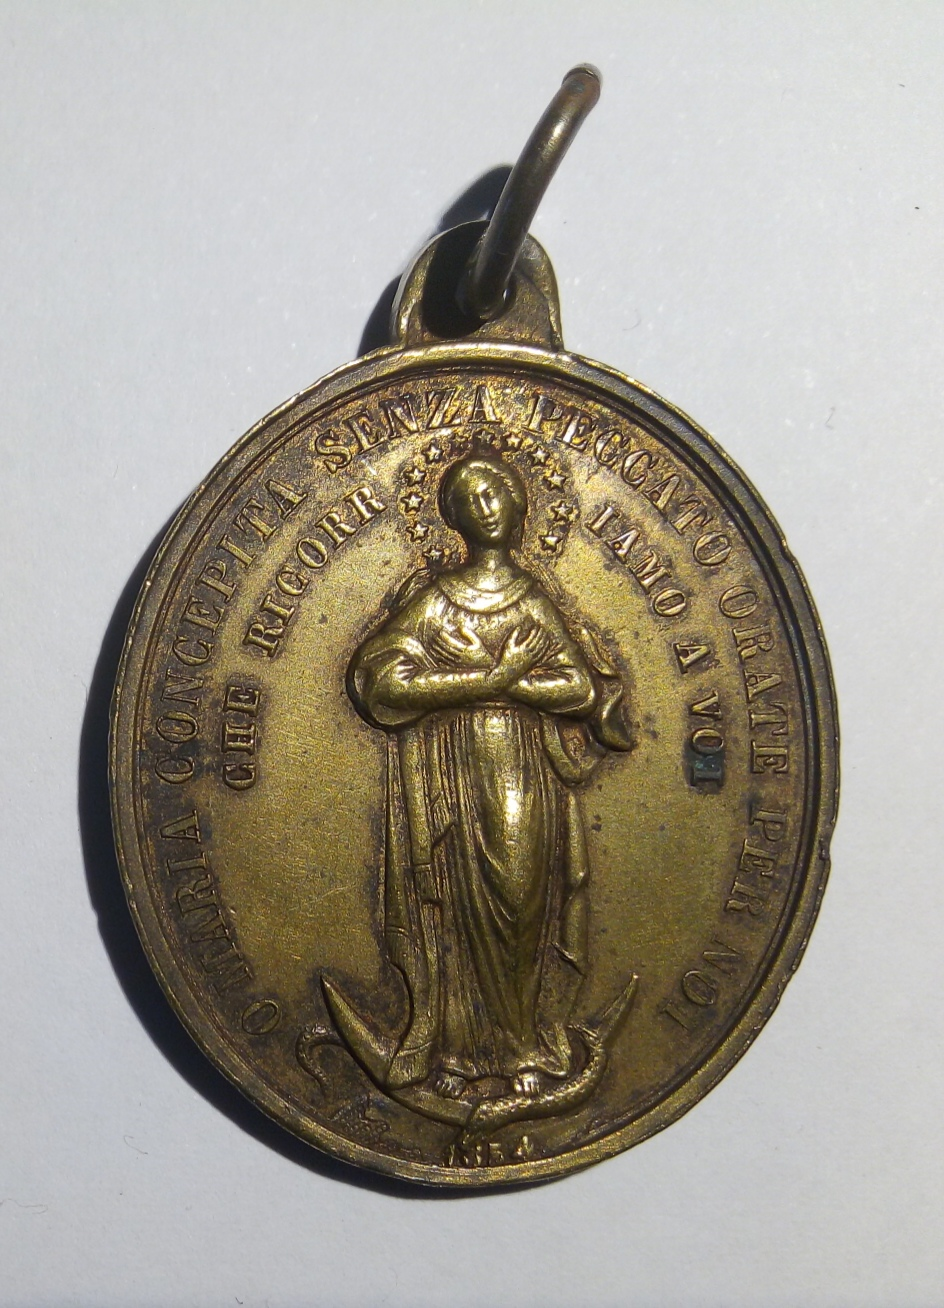 Medalla Pio IX / Inmaculada Concepción - fechada 1854 (R.M. SXIX-O100) Img_2012